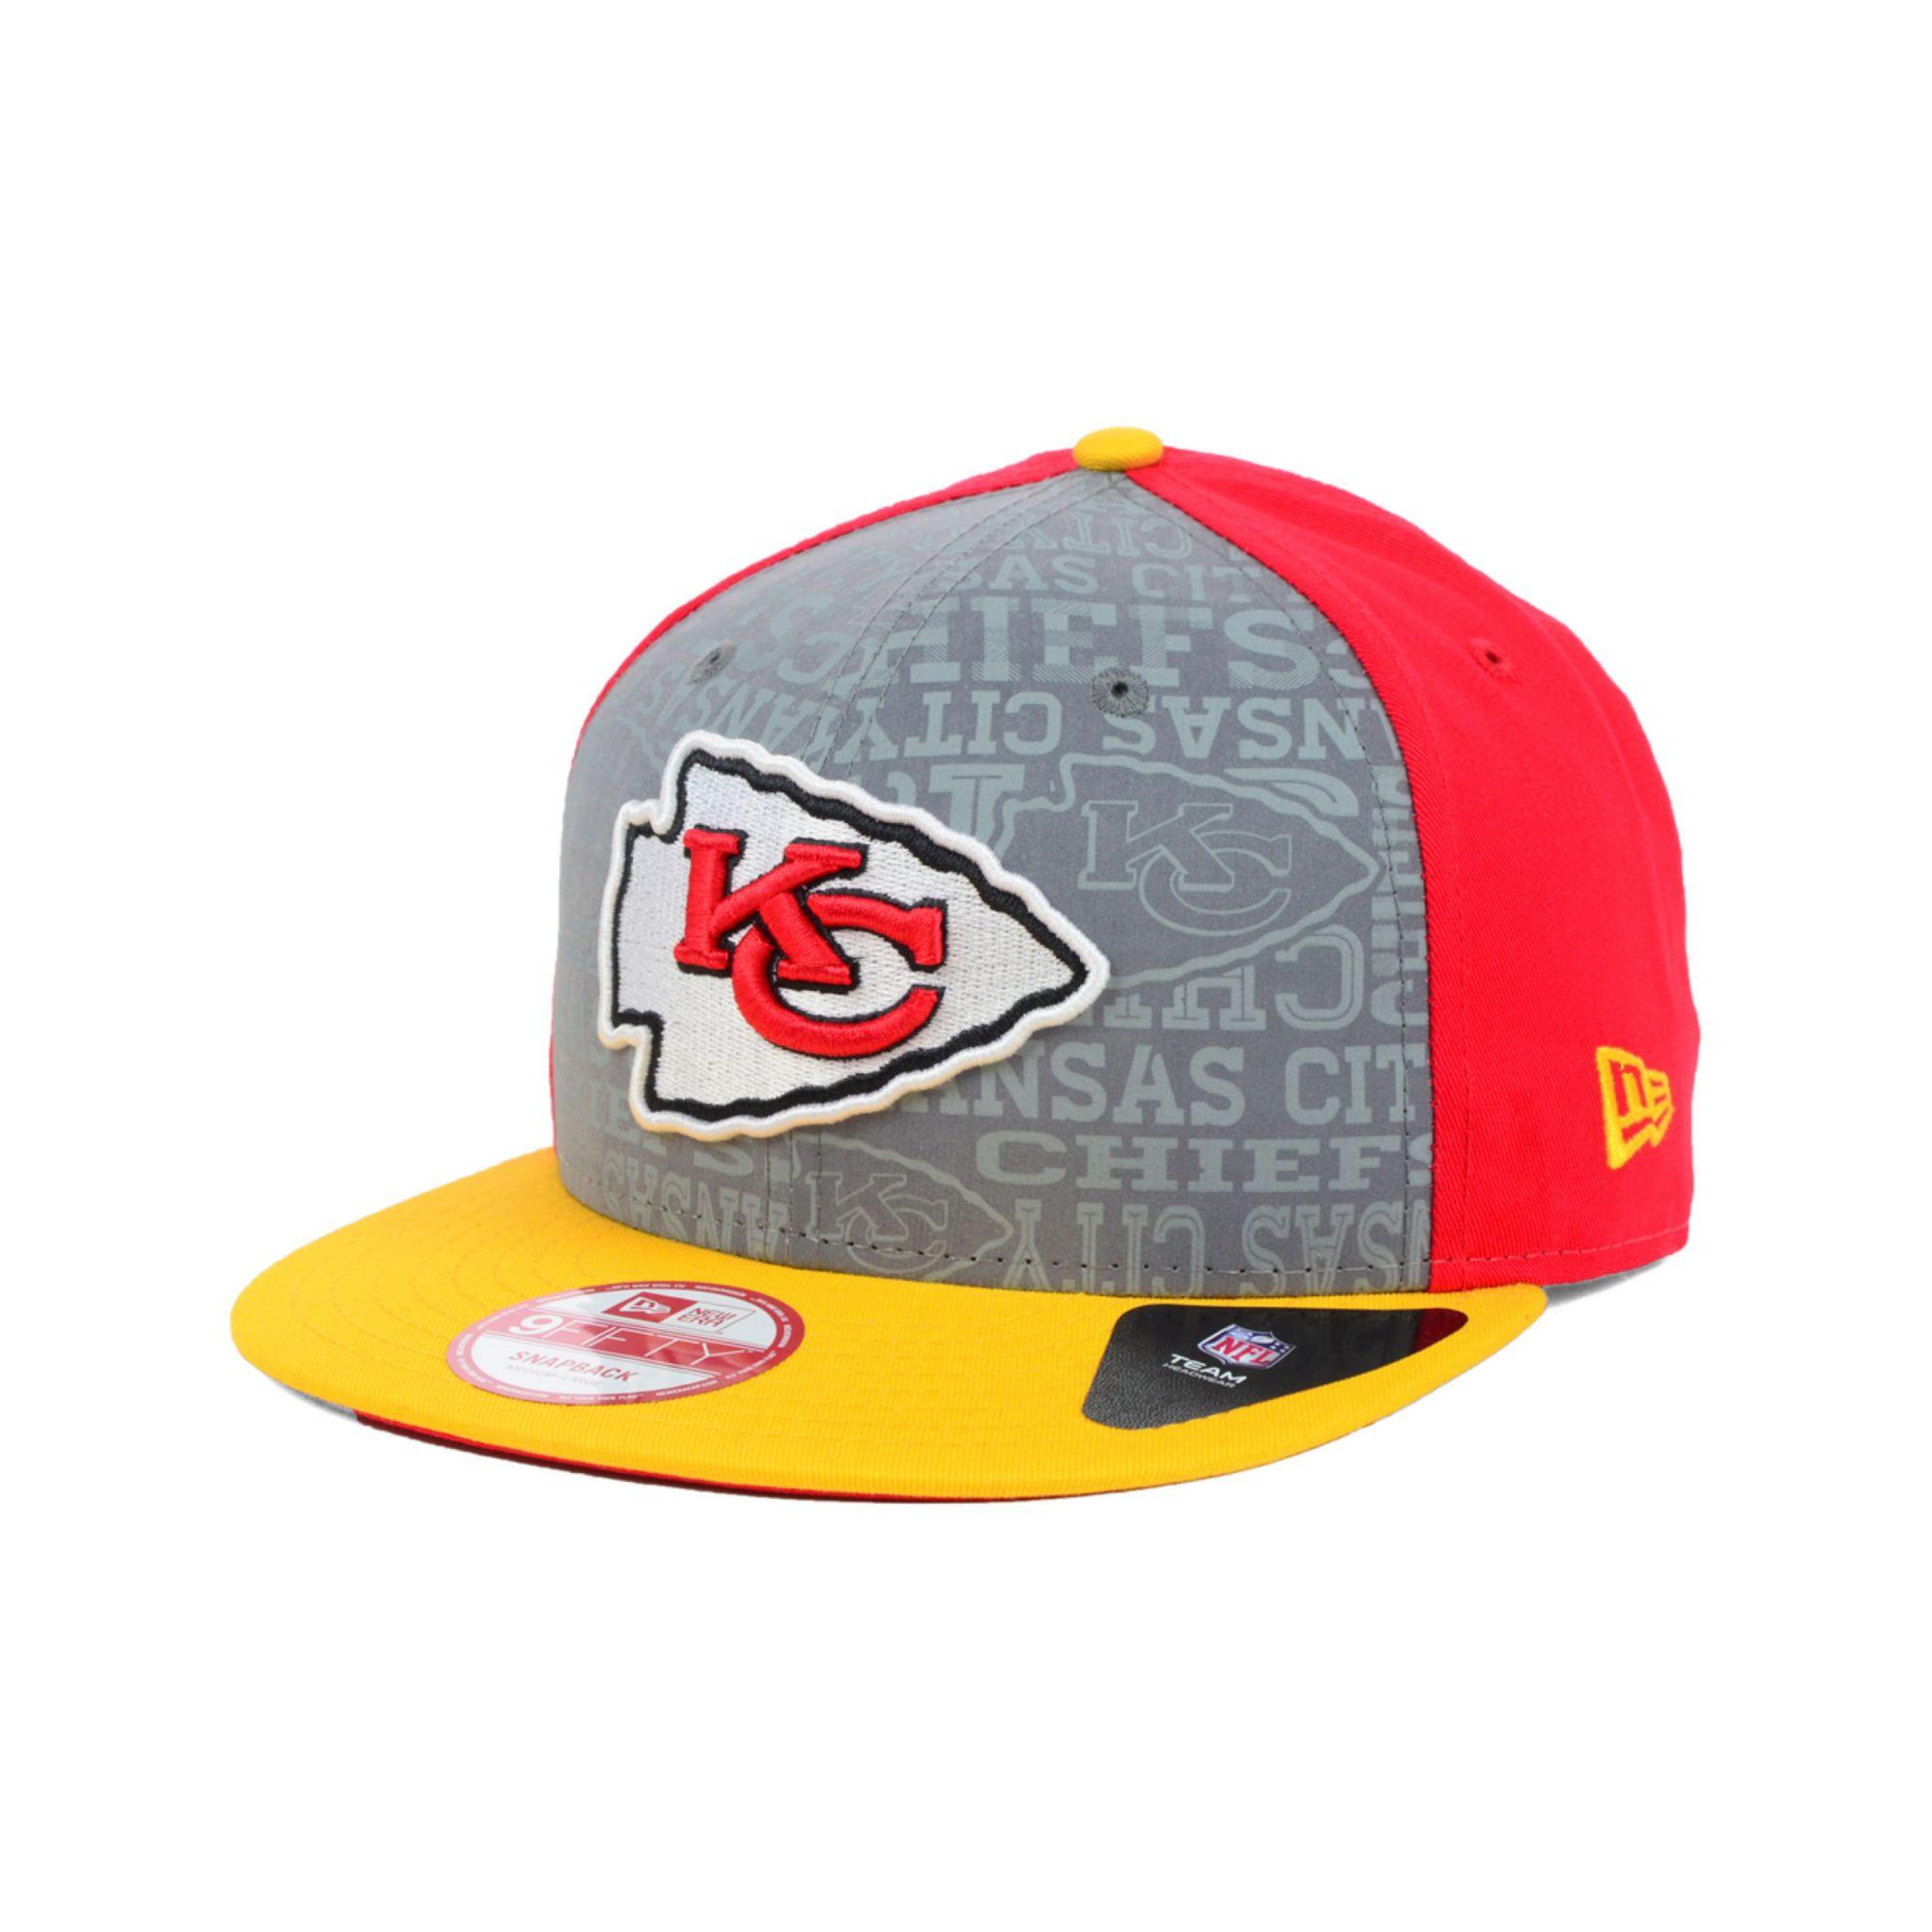 5cf444e6e Lyst - Ktz Kids Kansas City Chiefs Nfl Draft 9fifty Snapback Cap in ...